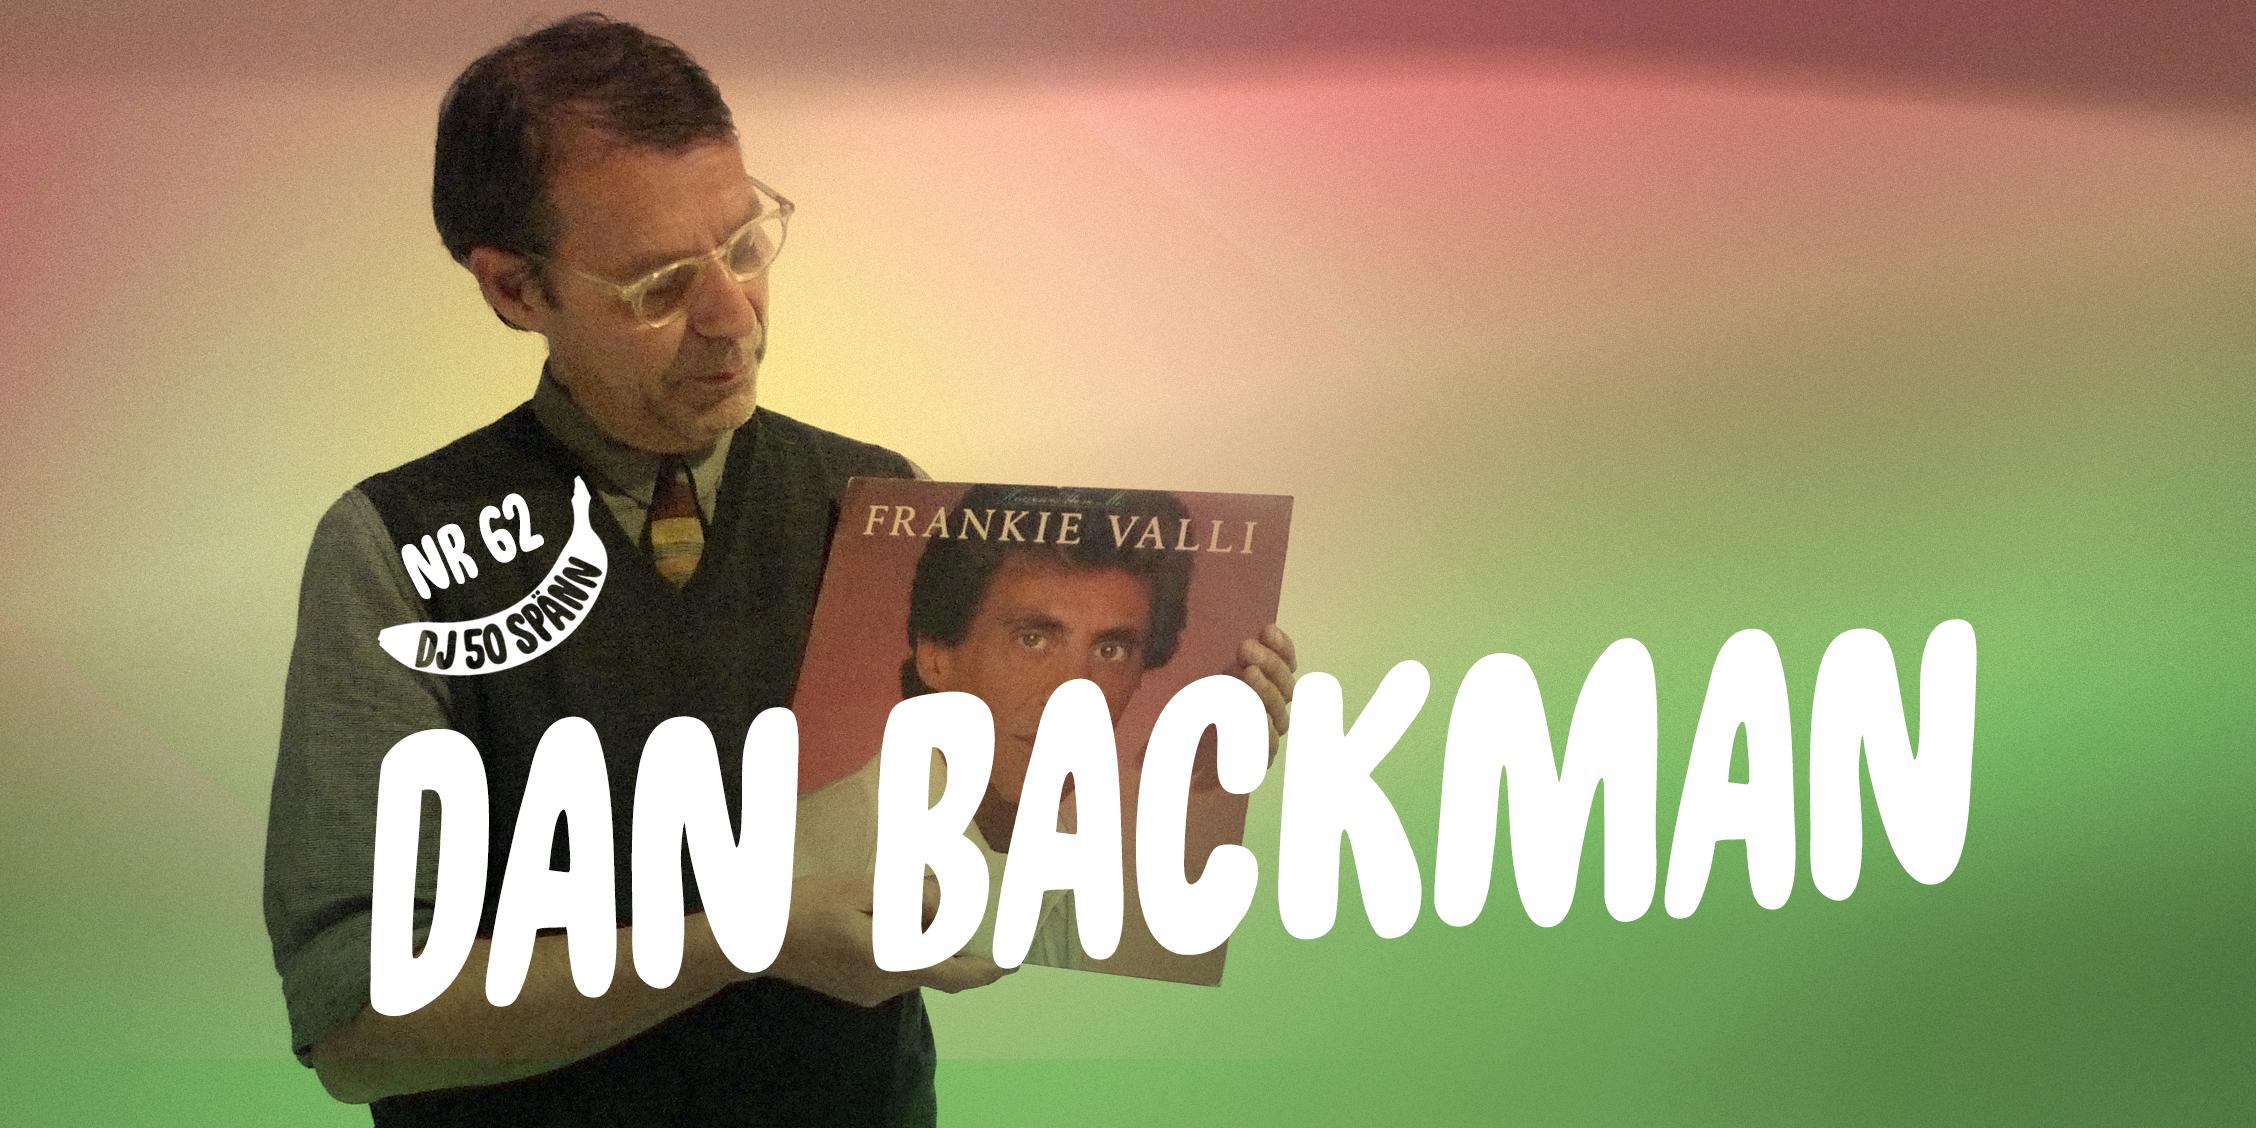 dan backman